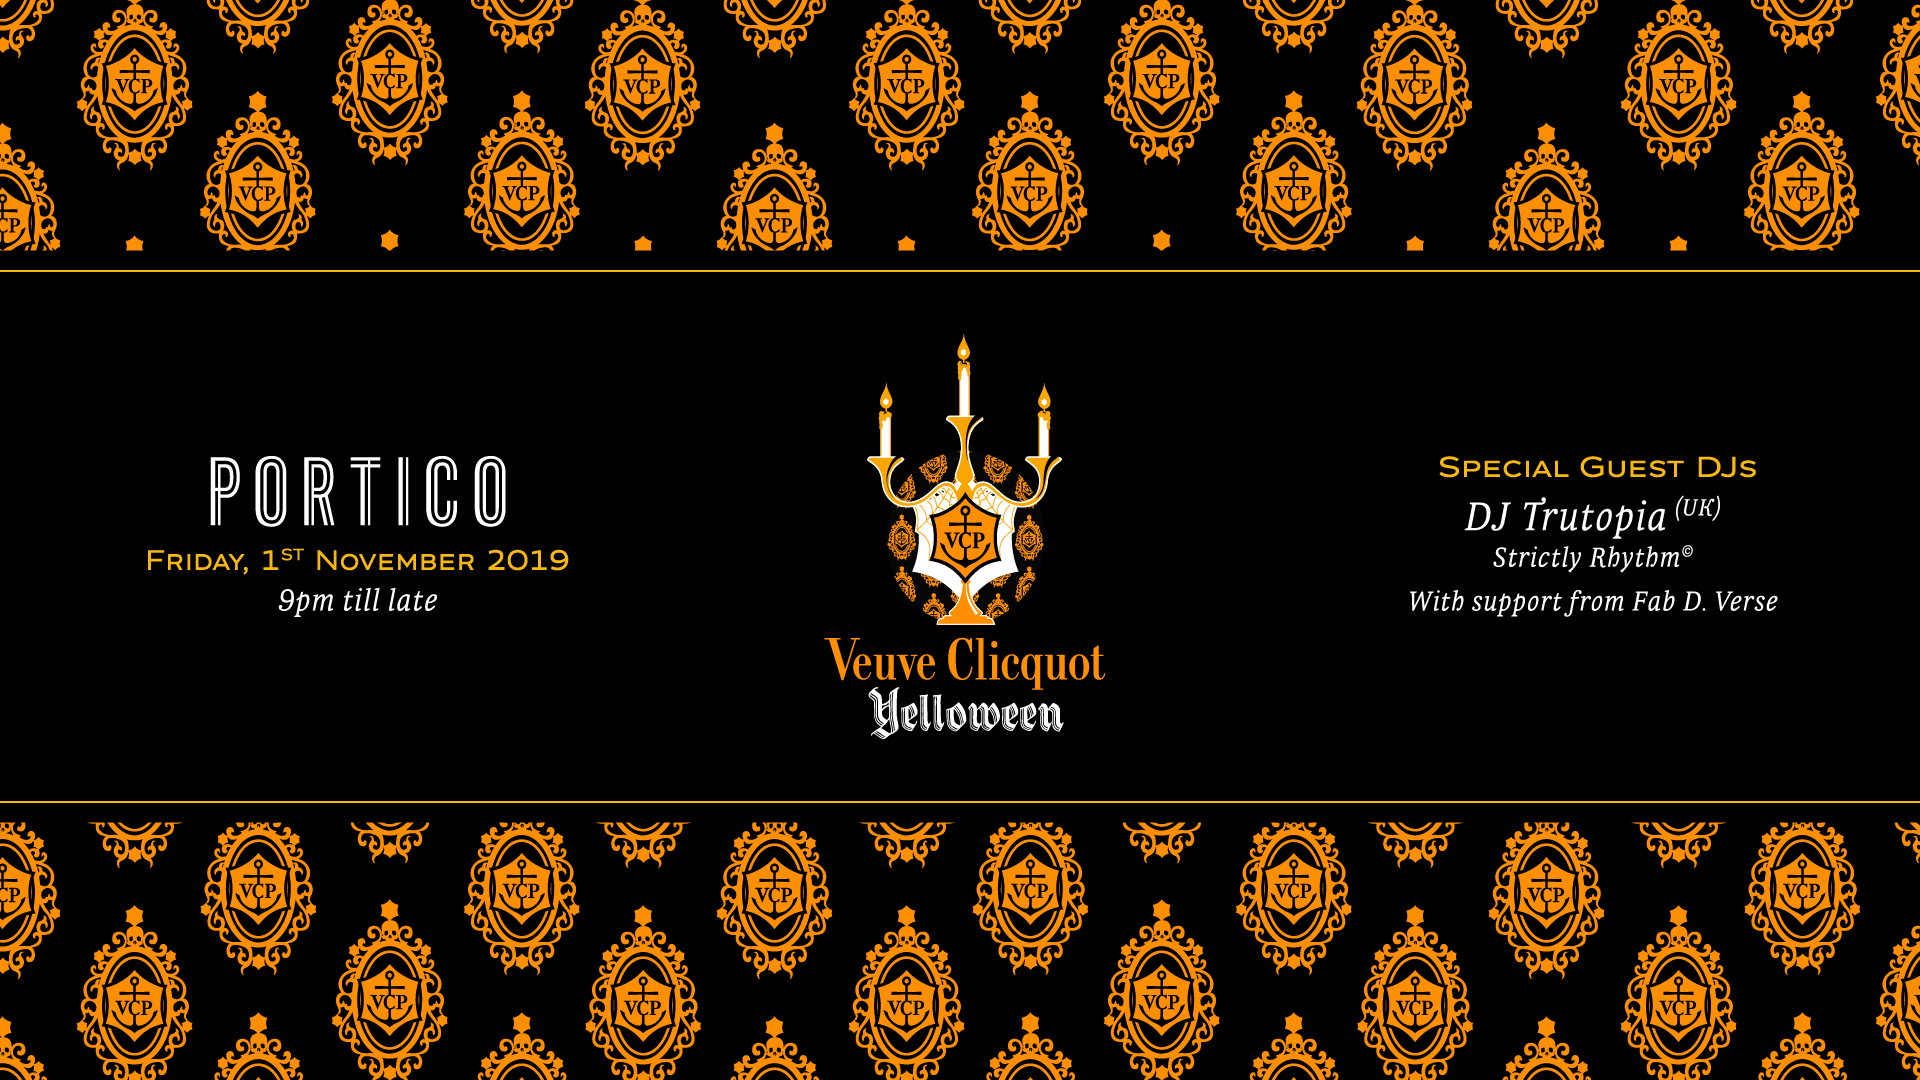 Portico Presents Veuve Clicquot Yelloween Honeycombers Hong Kong